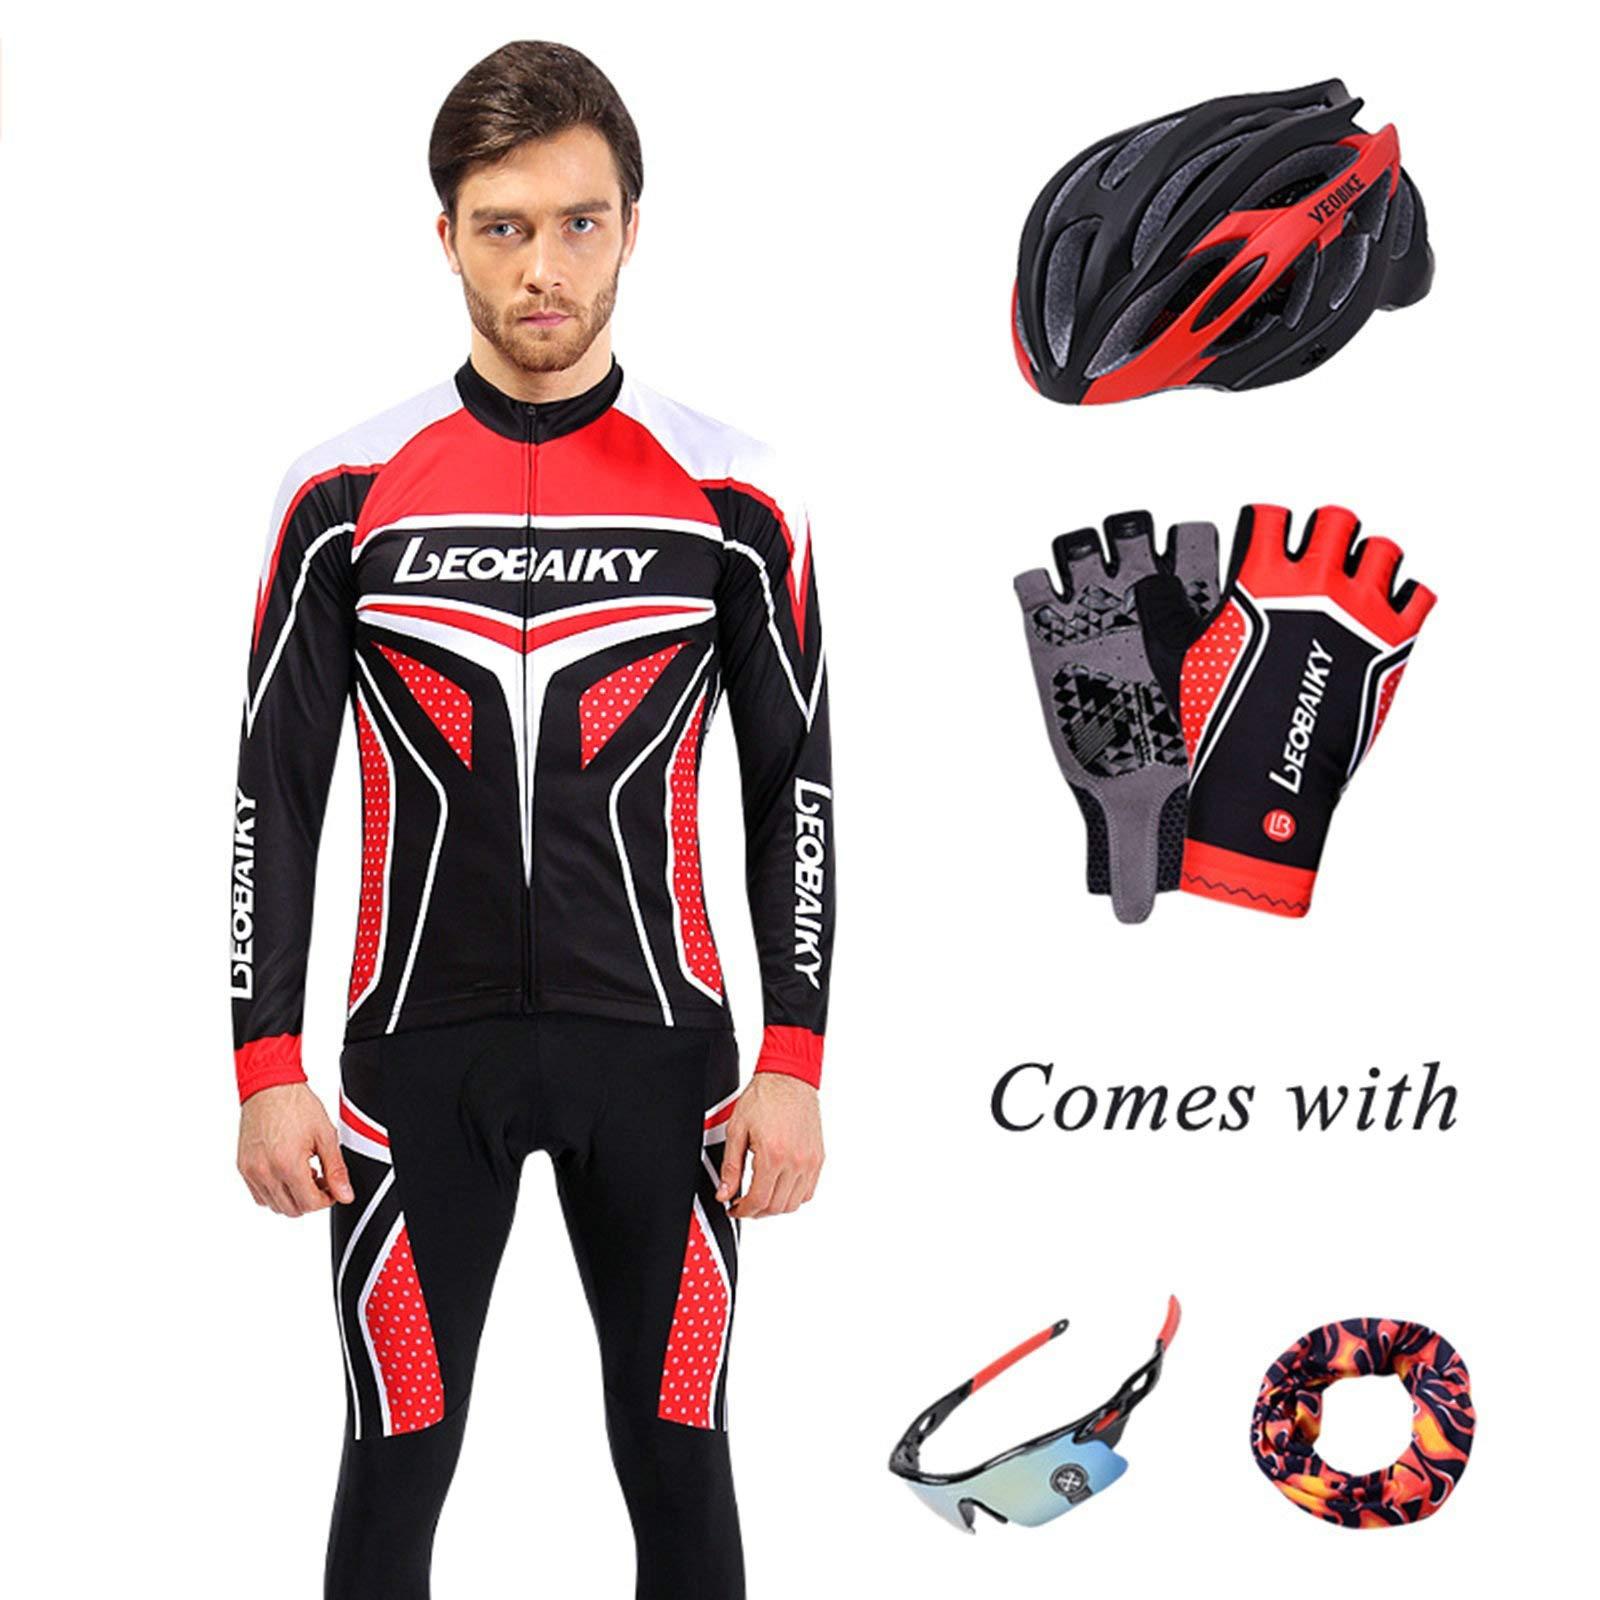 Aooaz Men's Biking Clothing Set Shirt Leggings with Helmet/Gloves/Goggles/Mask Black Red S